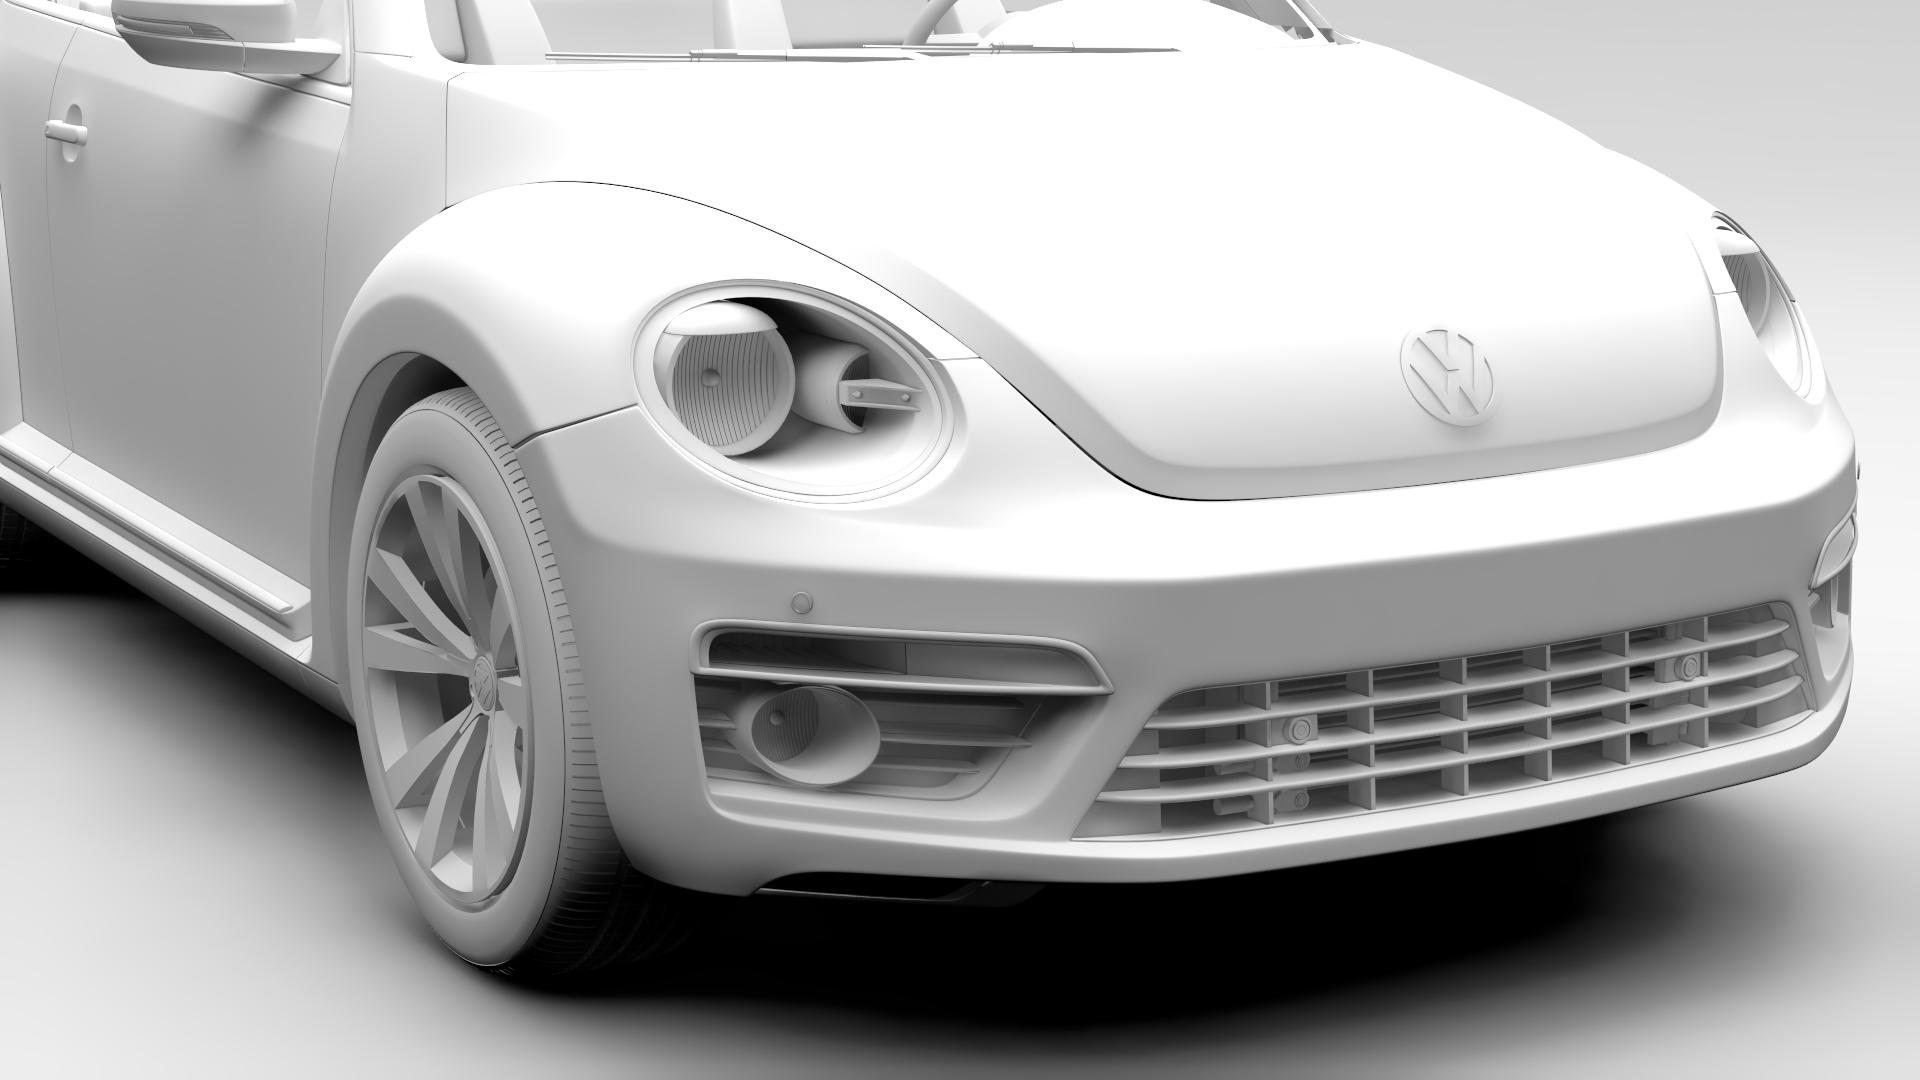 vw beetle cabriolet 2017 3d model 3ds max fbx c4d lwo ma mb hrc xsi obj 221602